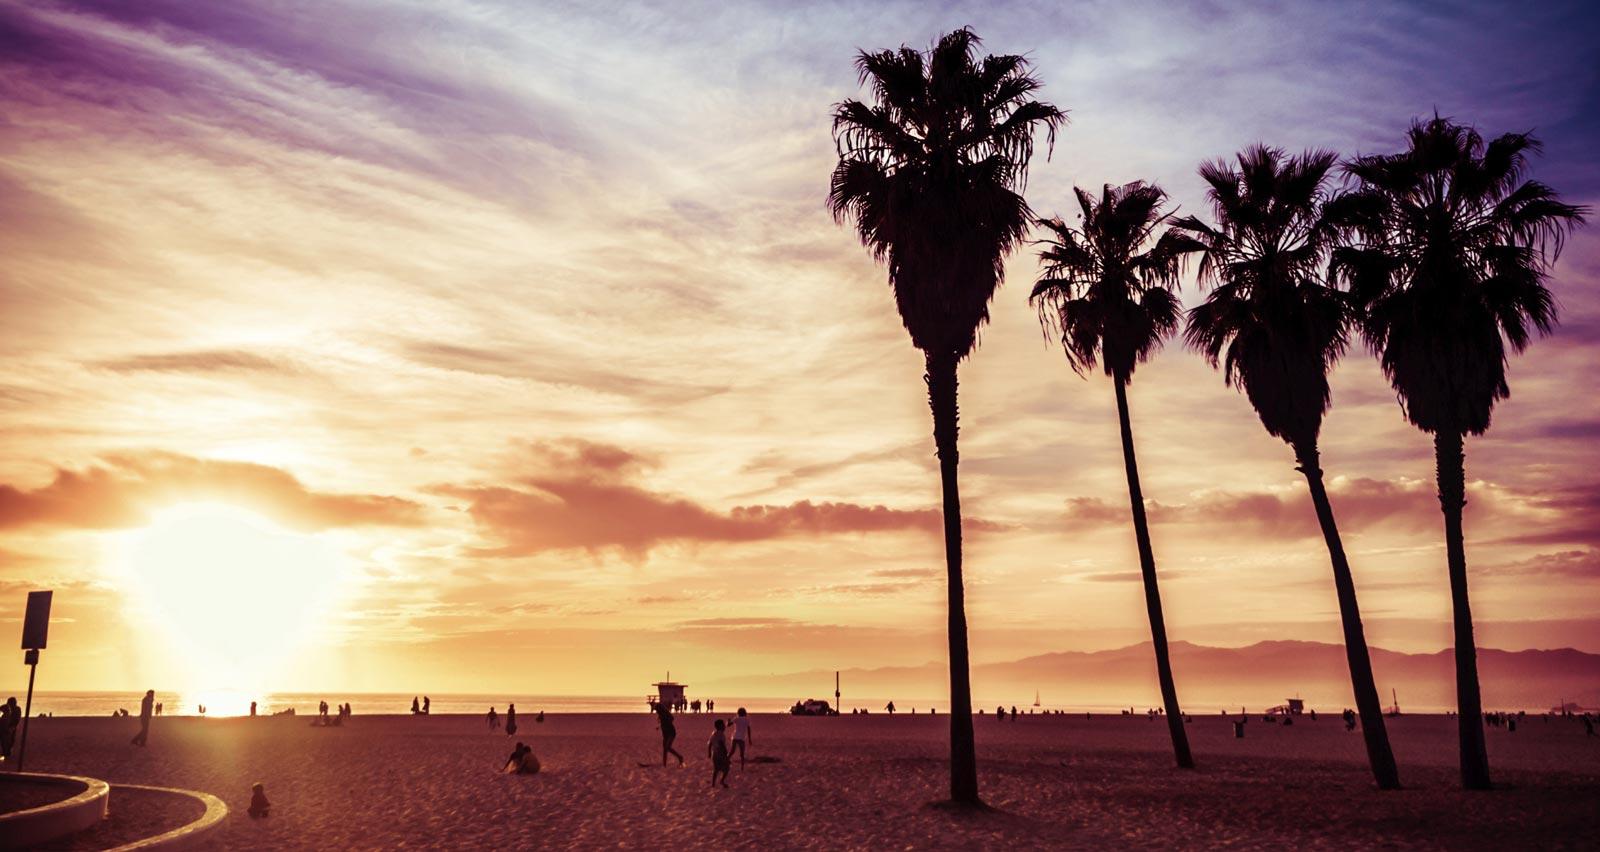 Flüge in den Sommerferien ab DUS / FRA / STR / MUC / BER / NUE / HAM / HAJ nach Los Angeles unter 500€ (AA/BA/IB)